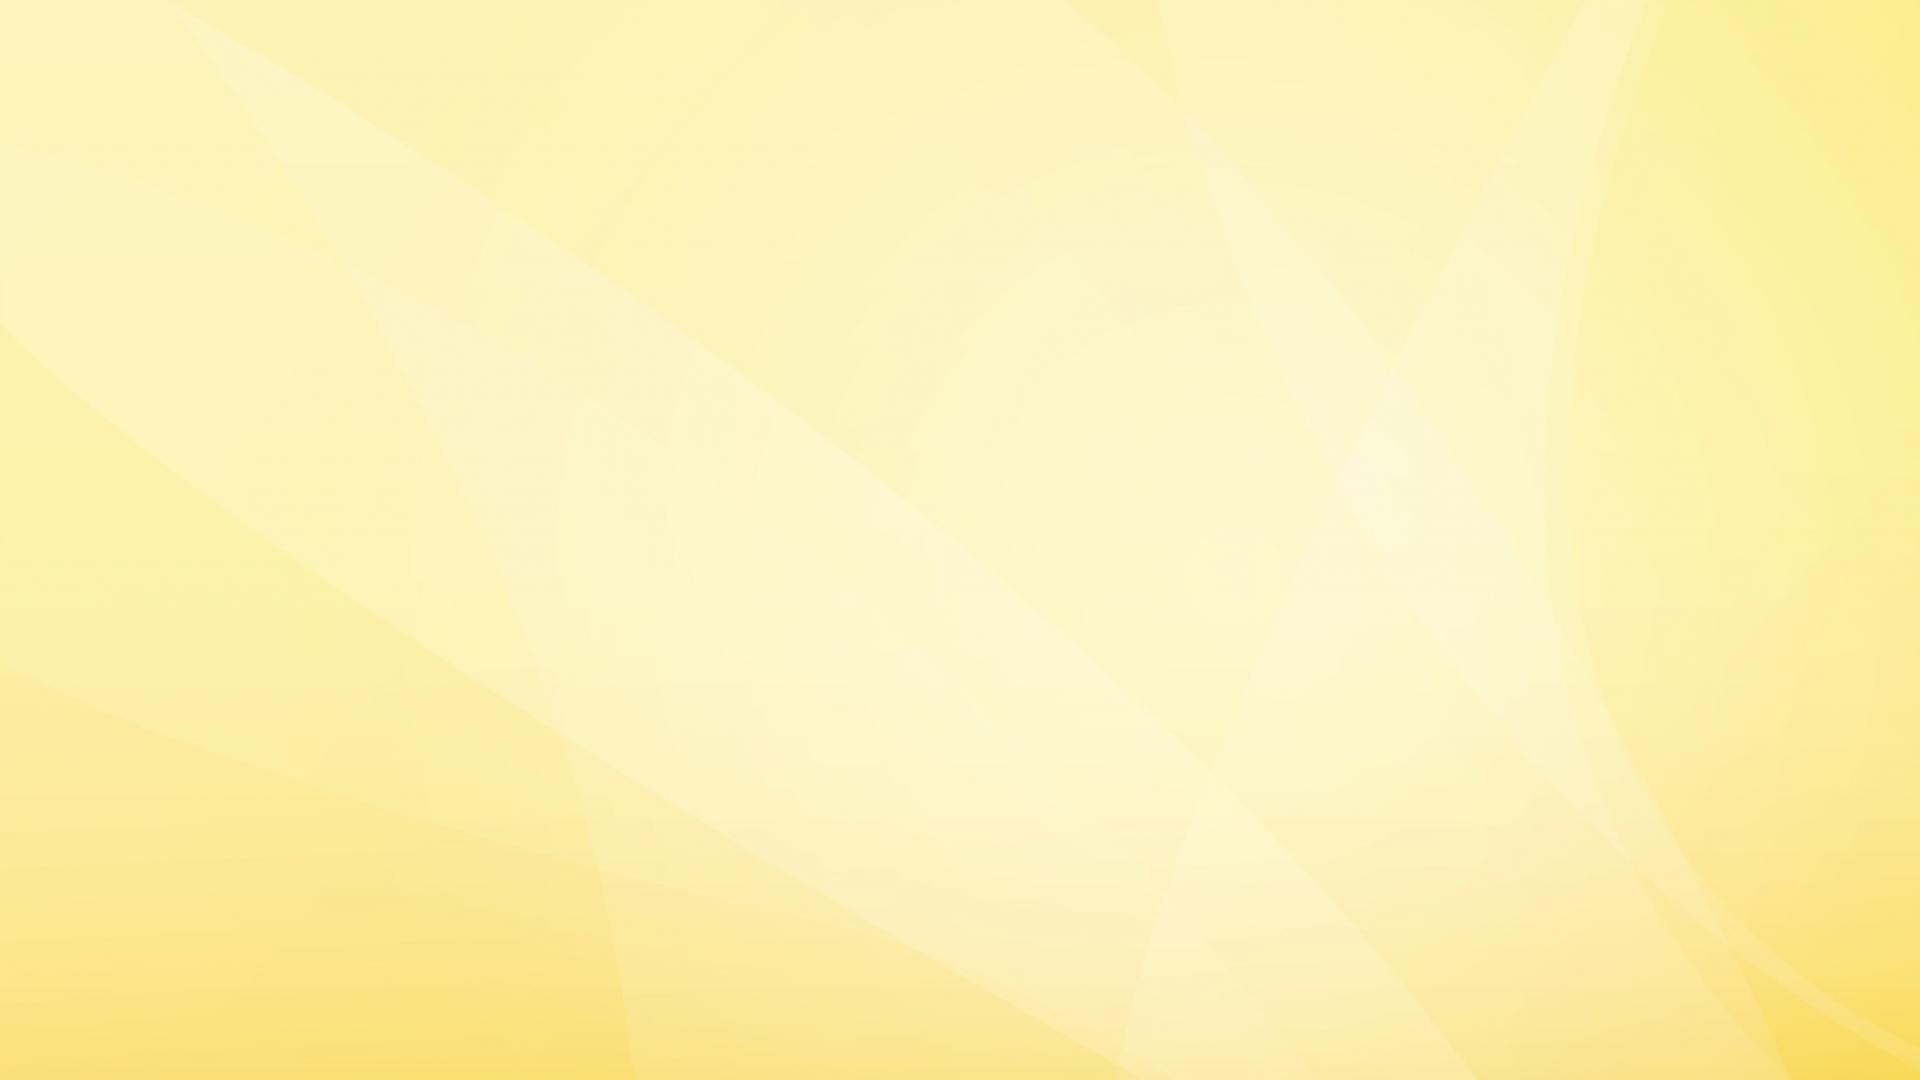 49 Interpretations Of The Yellow Wallpaper On